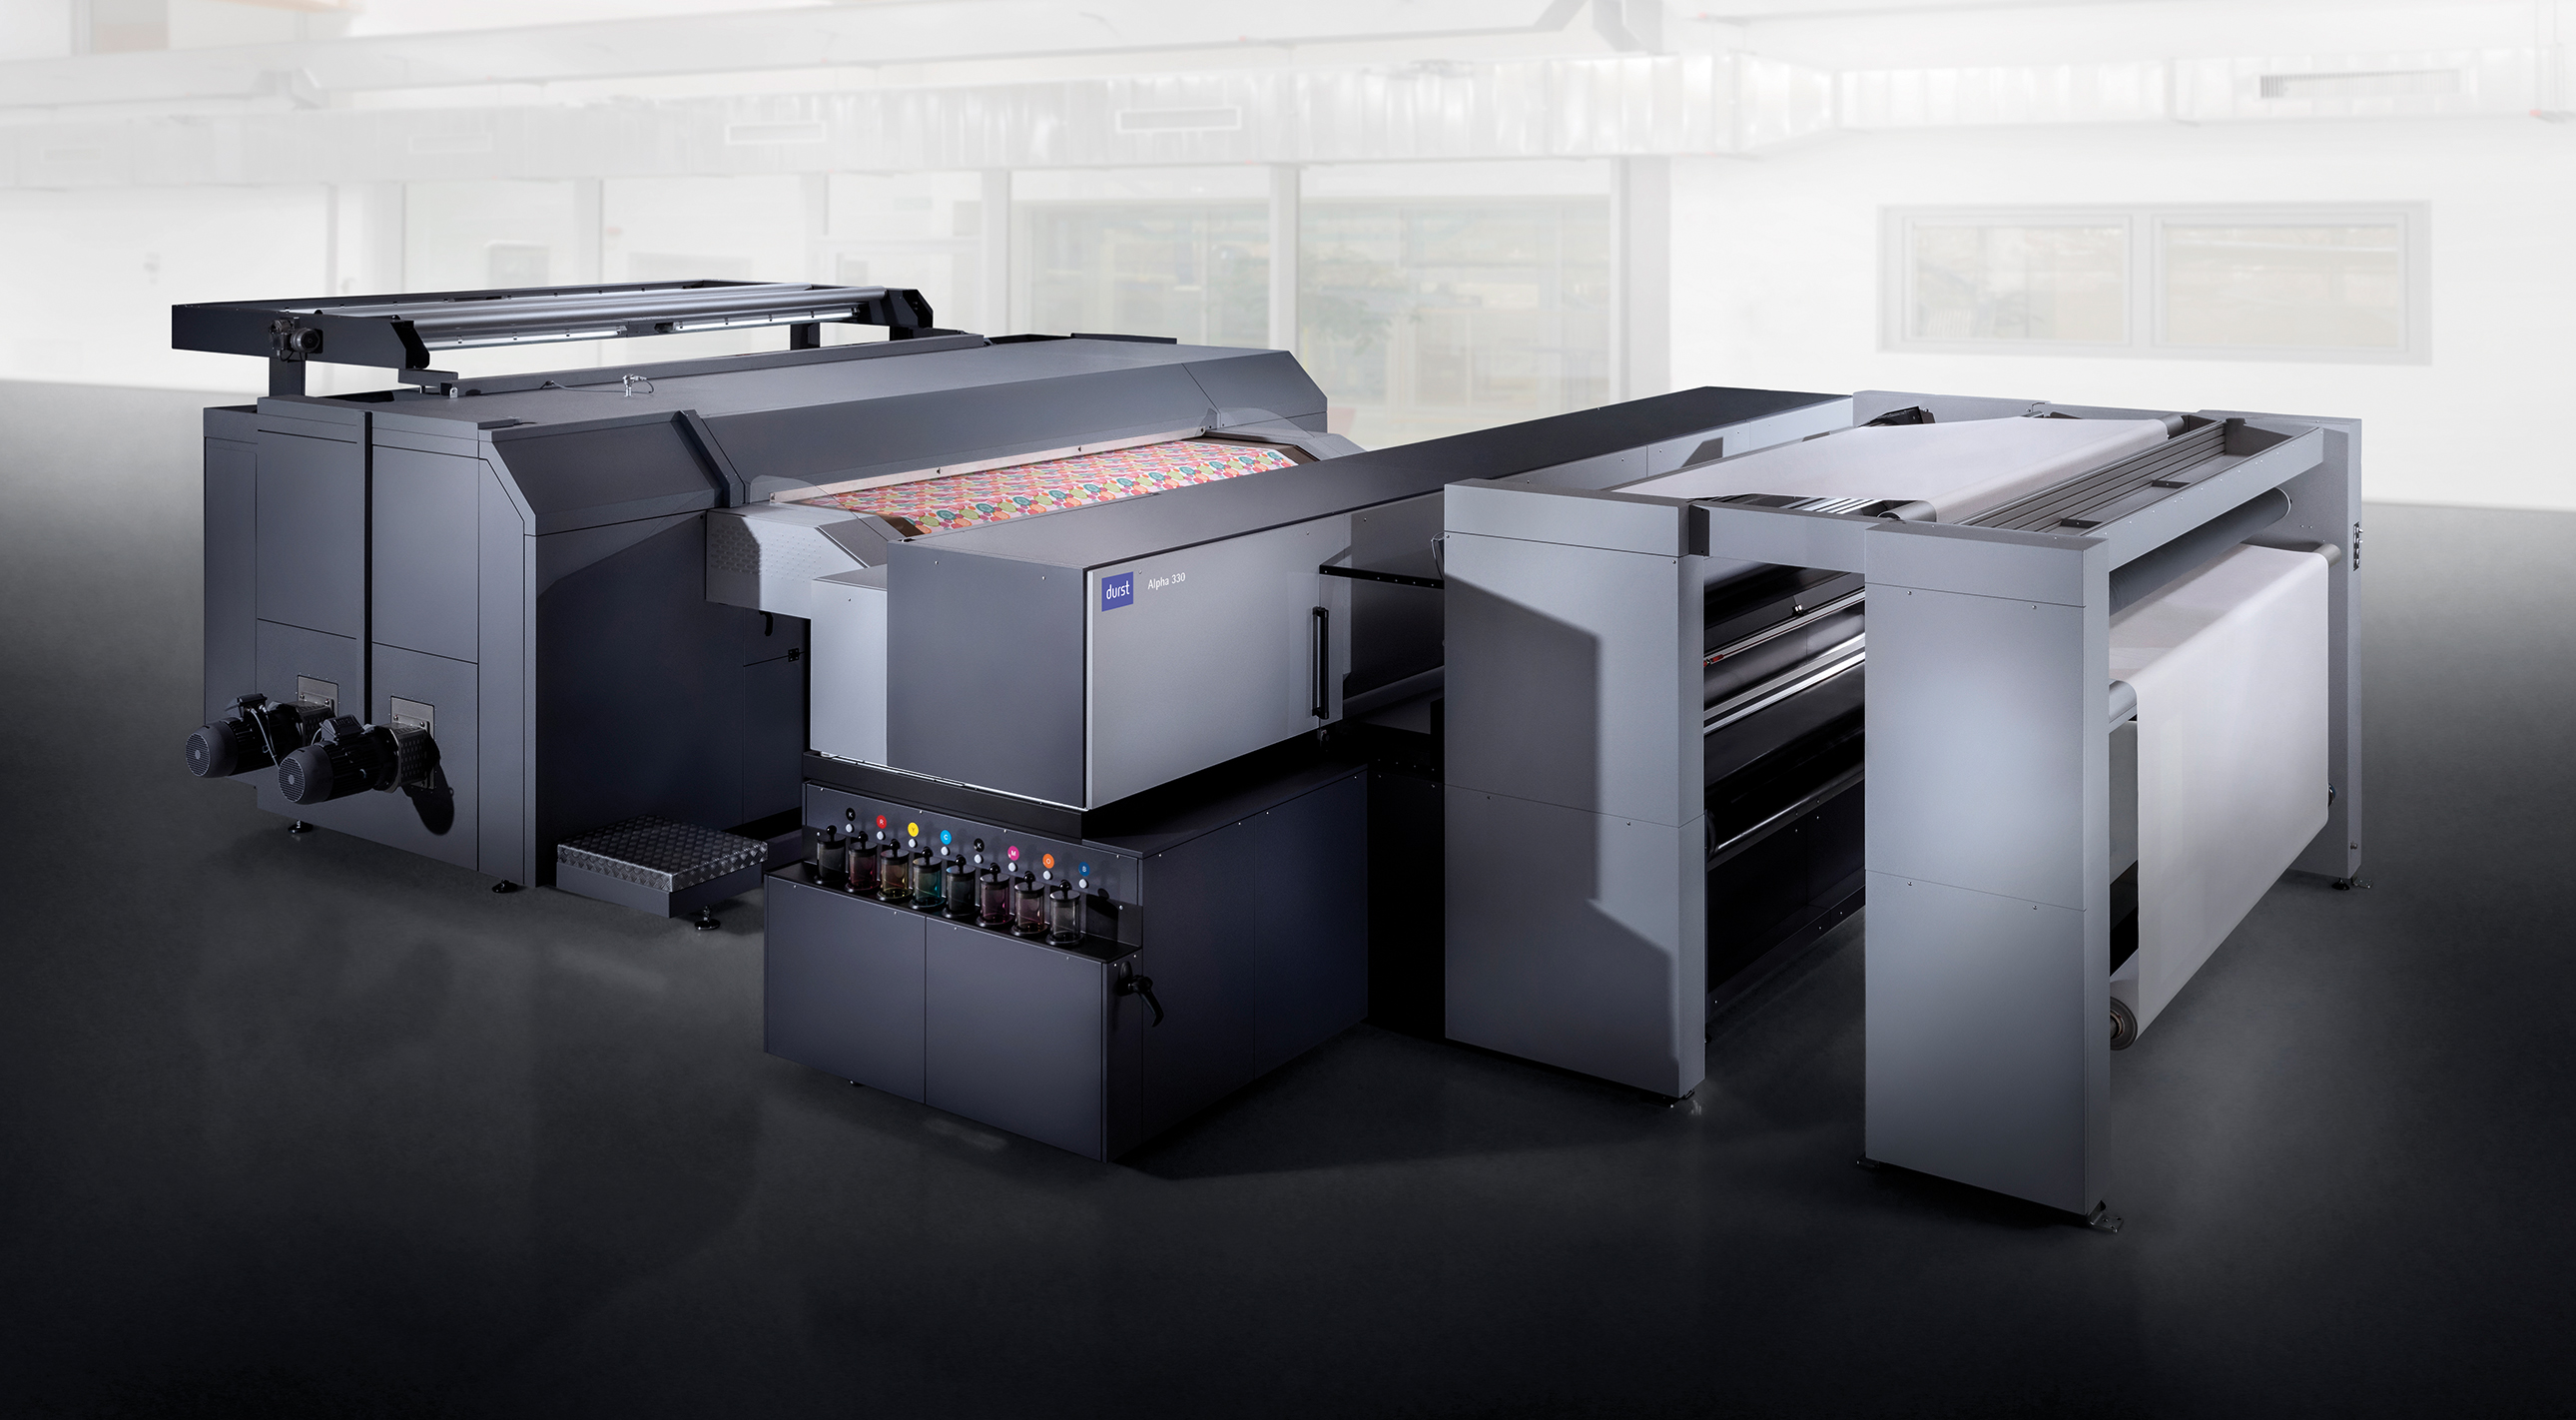 Durst, stampanti inkjet multipass per il tessuto